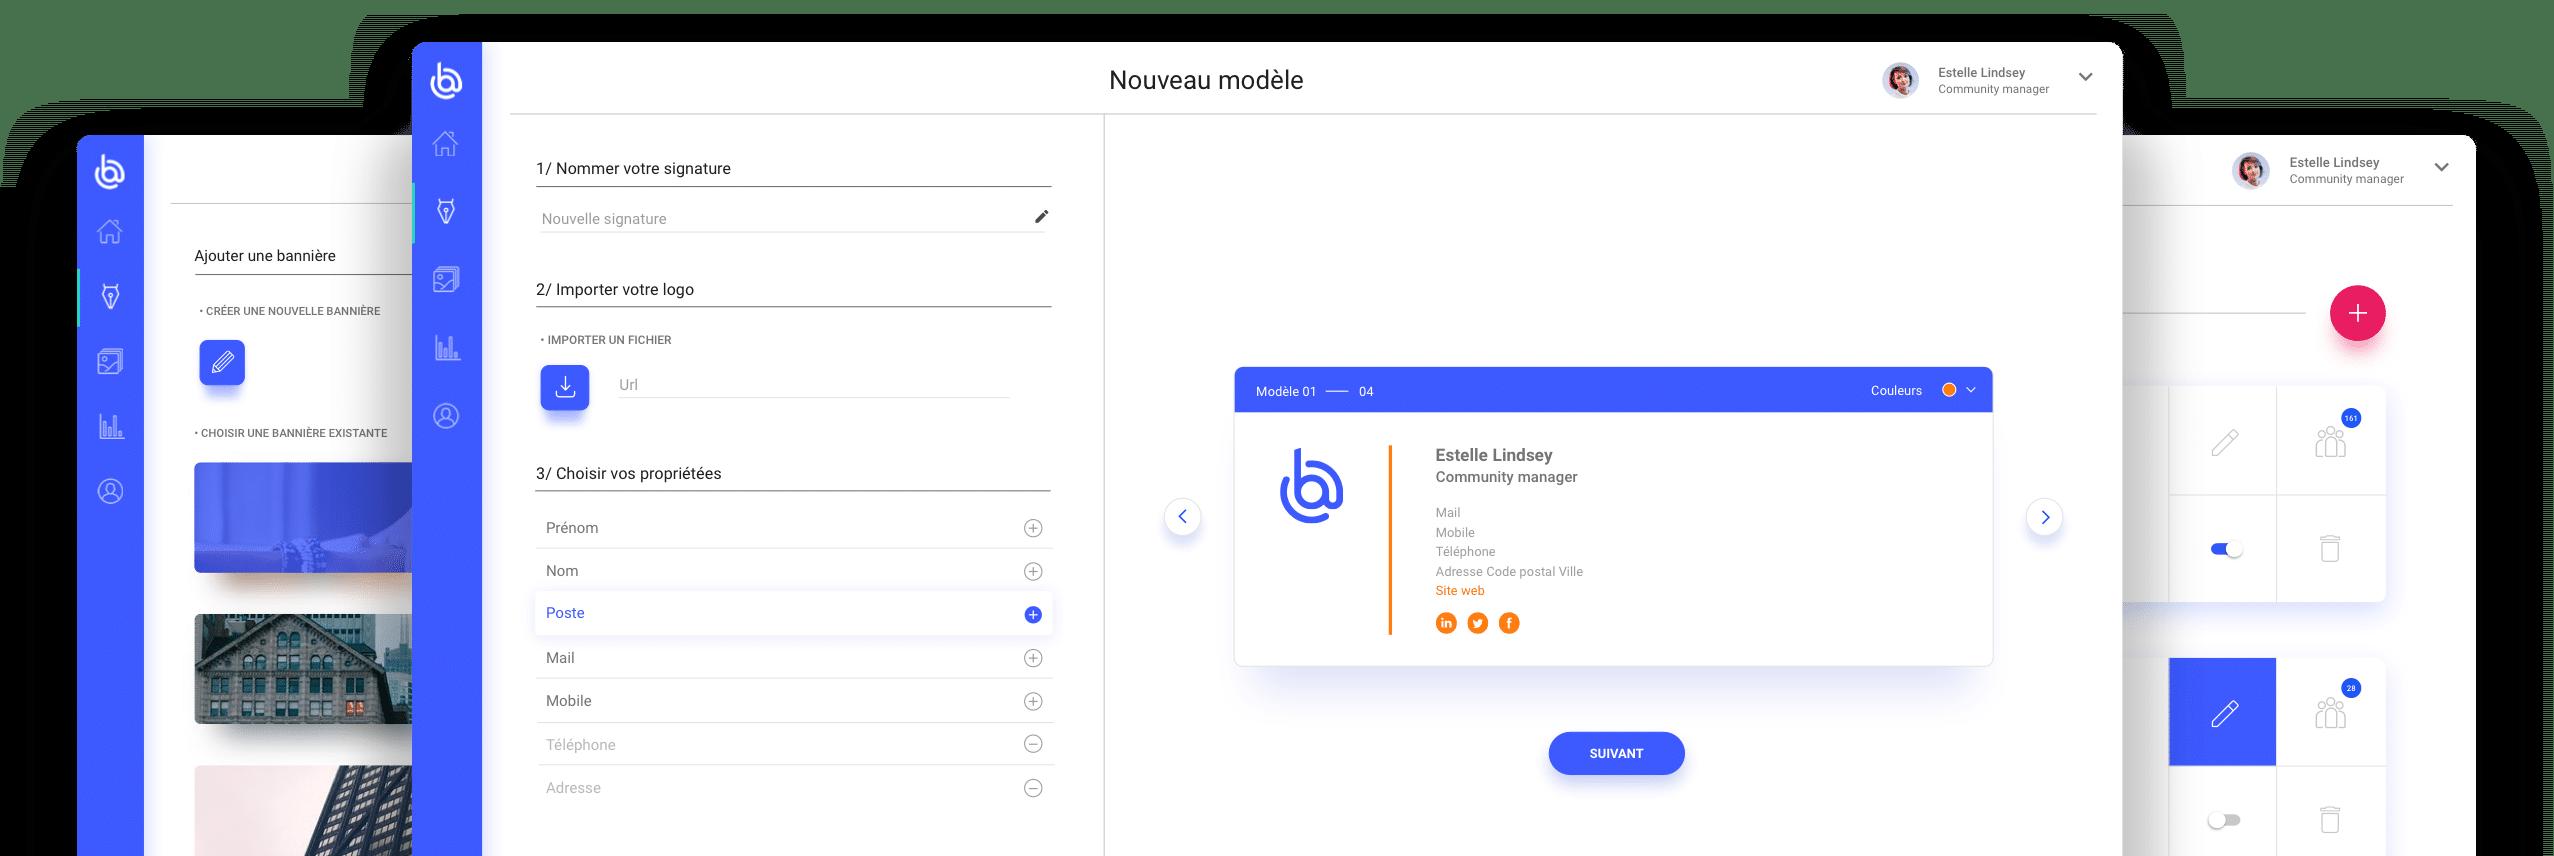 interface de l'outil boostmymail